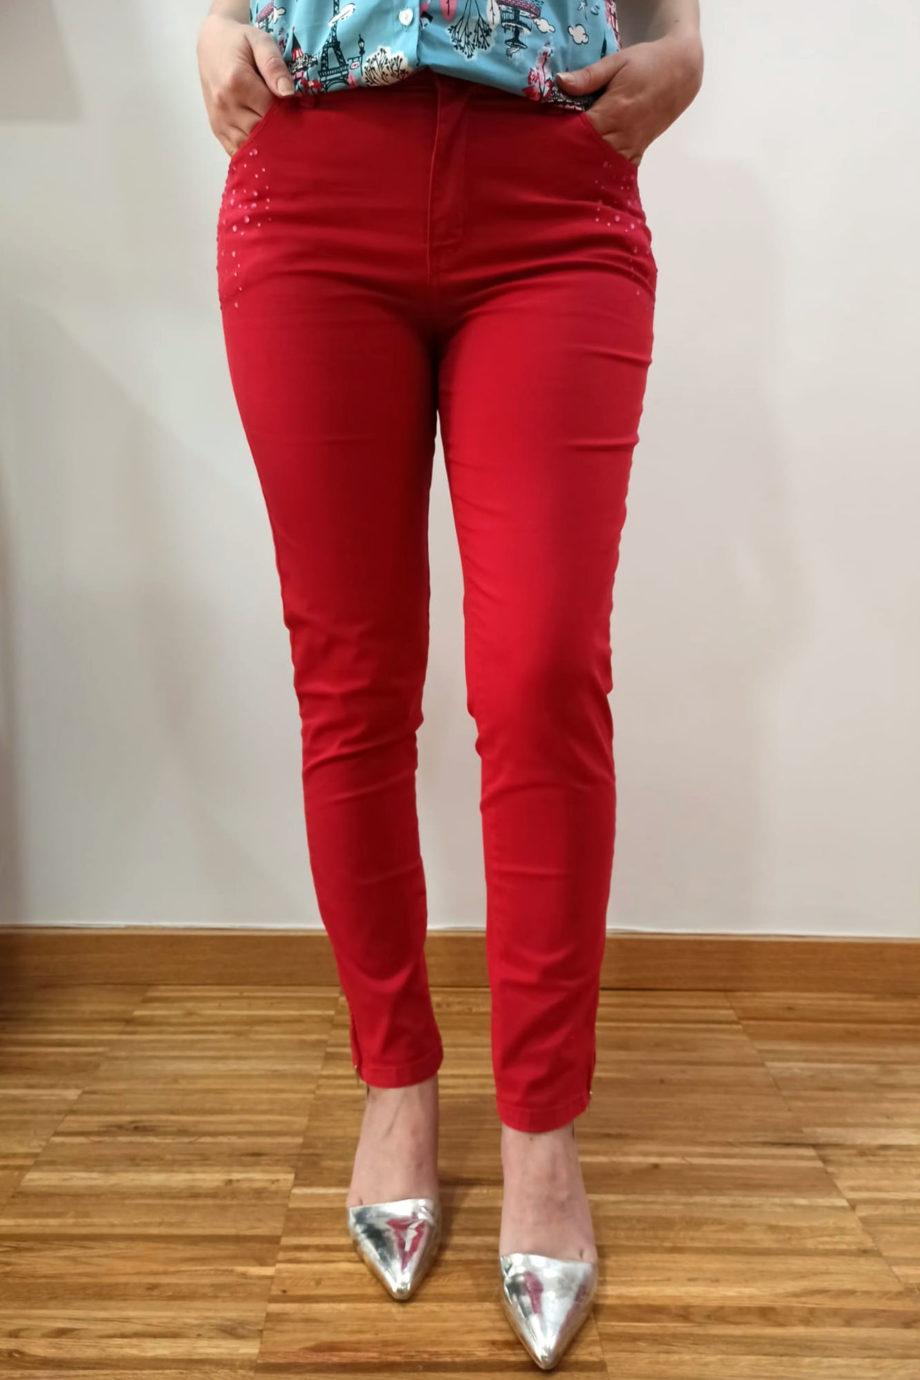 cowest-pantalon-rubí